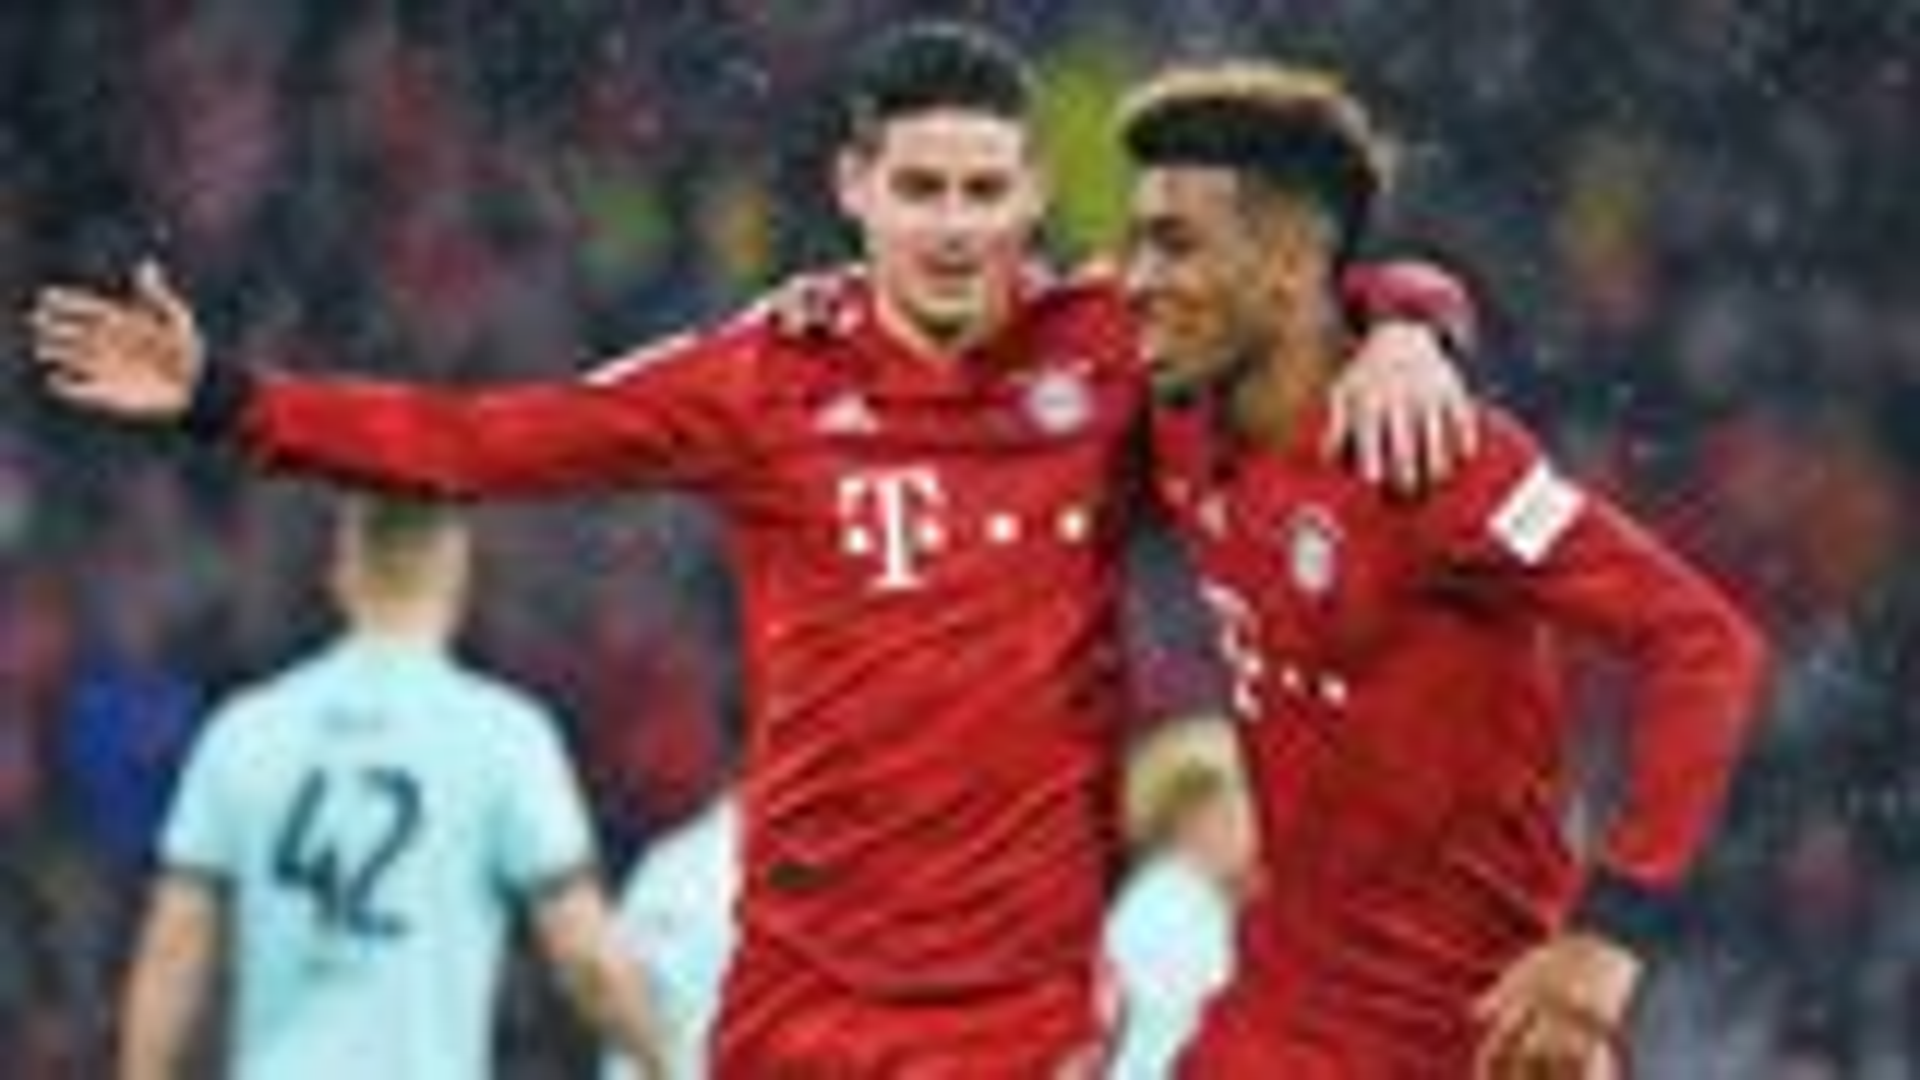 James hat-trick and milestone Davies goal send Bayern top